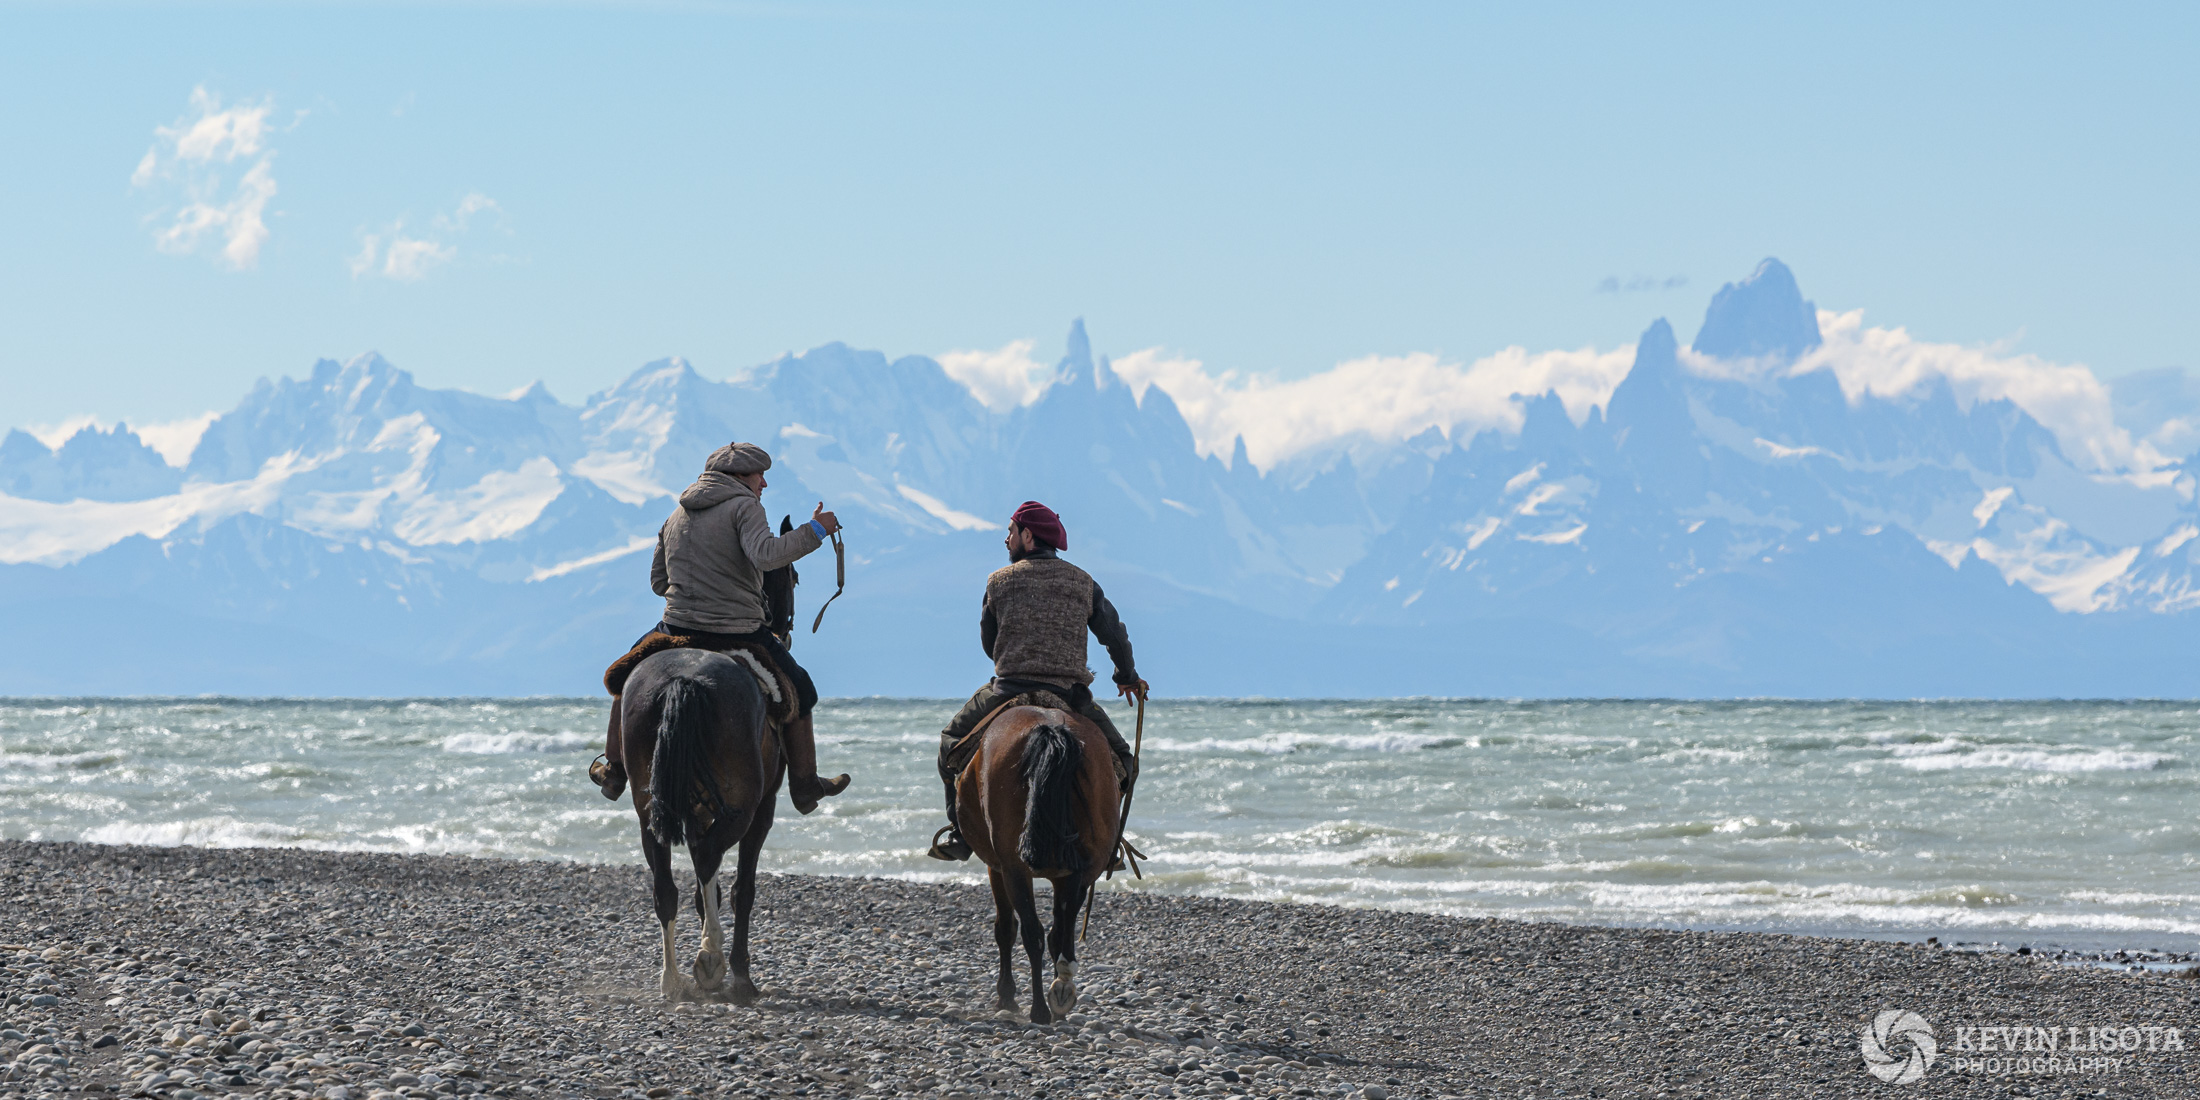 Gauchos on the shore of Lake Viedma